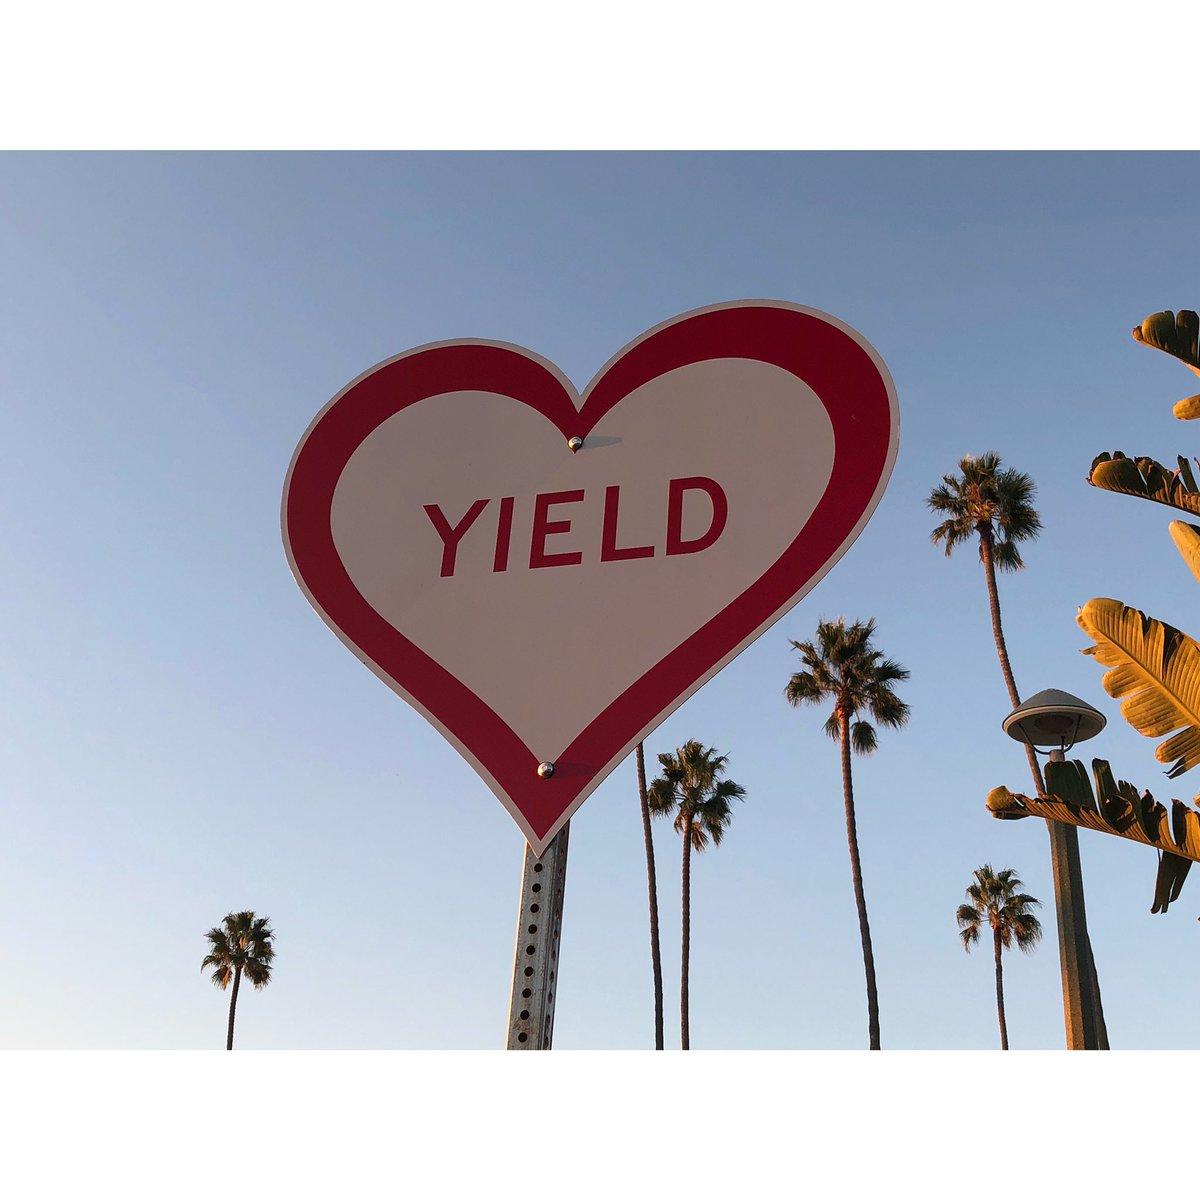 📷: 10/18/18 6:01PM  #Photography #StreetPhotography #Love #Energy #Light #Peace #KeepYourHeartOpen #Art  #PublicArt #ScottFroschauer  #Consciousness #California  #HolographicUniverse #Guido📸